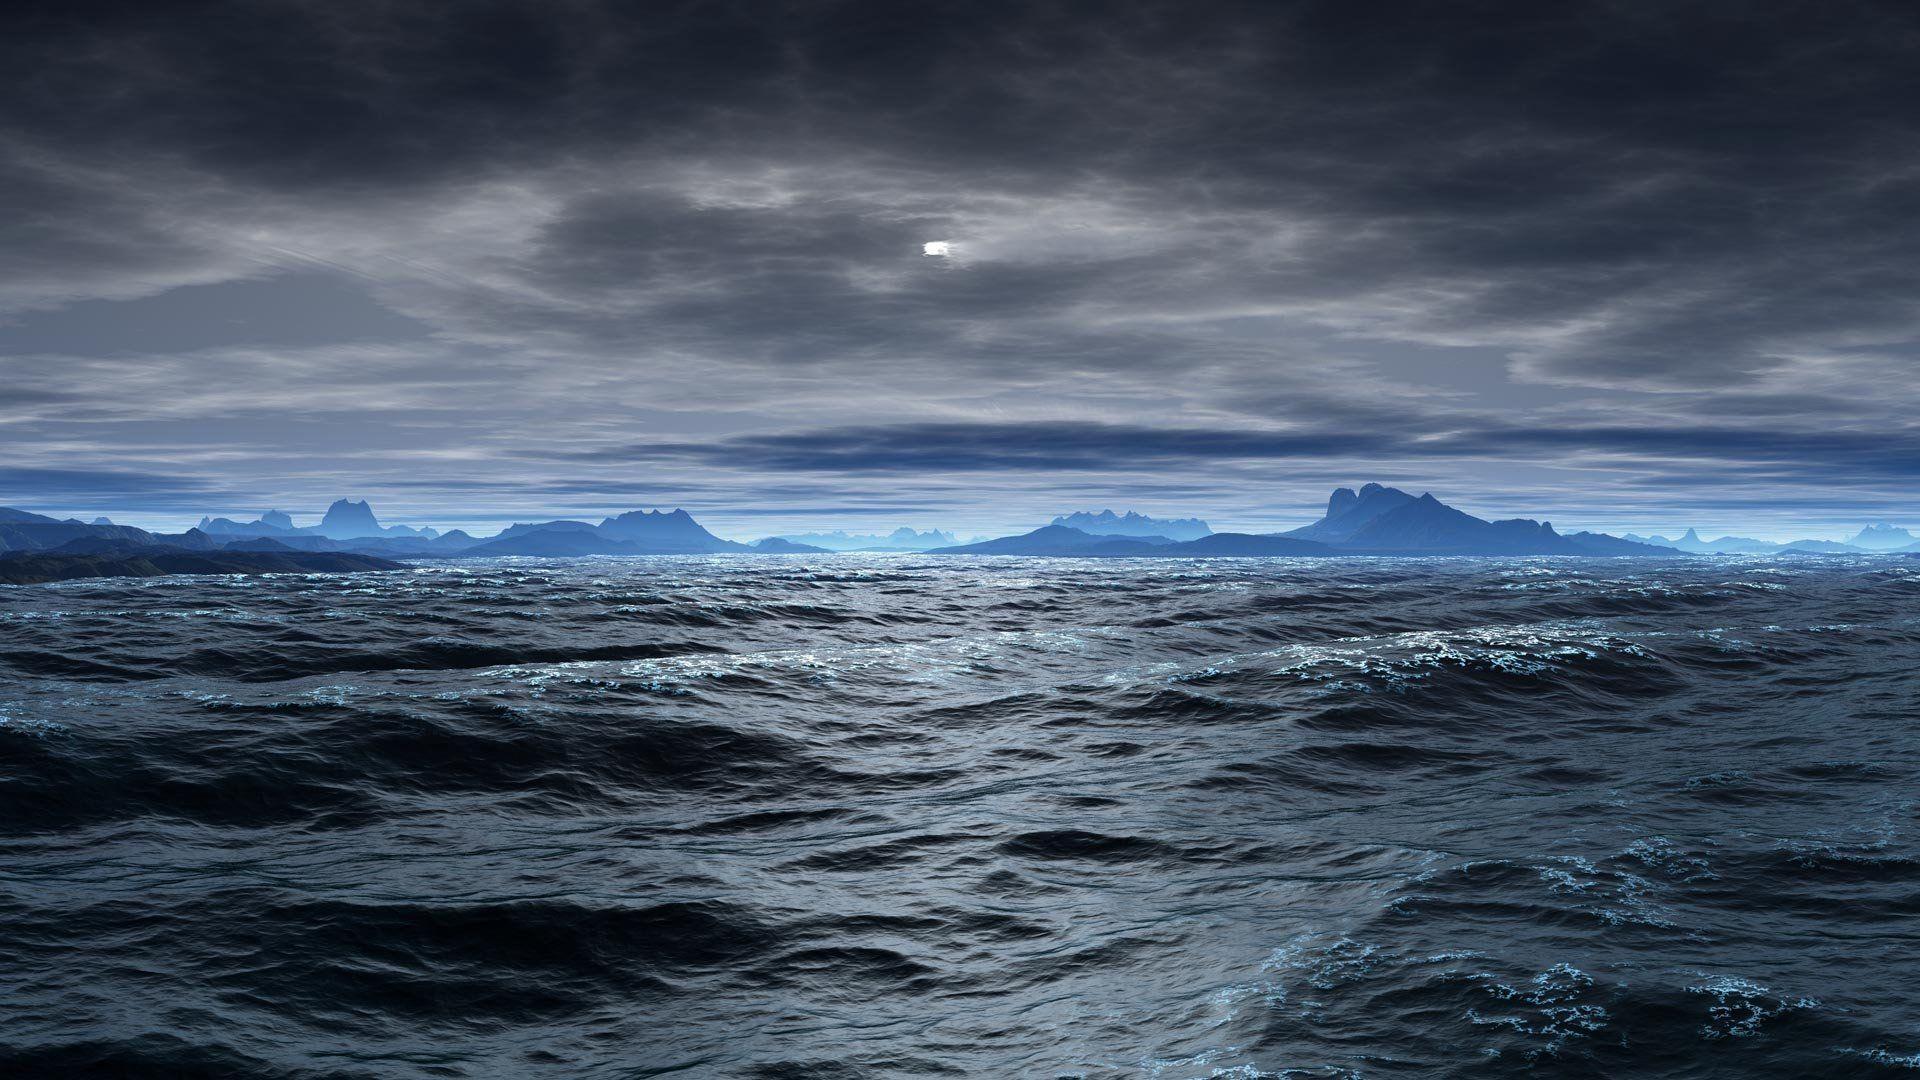 1920x1080 Hd Ocean Wallpapers Top Free 1920x1080 Hd Ocean Backgrounds Wallpaperaccess